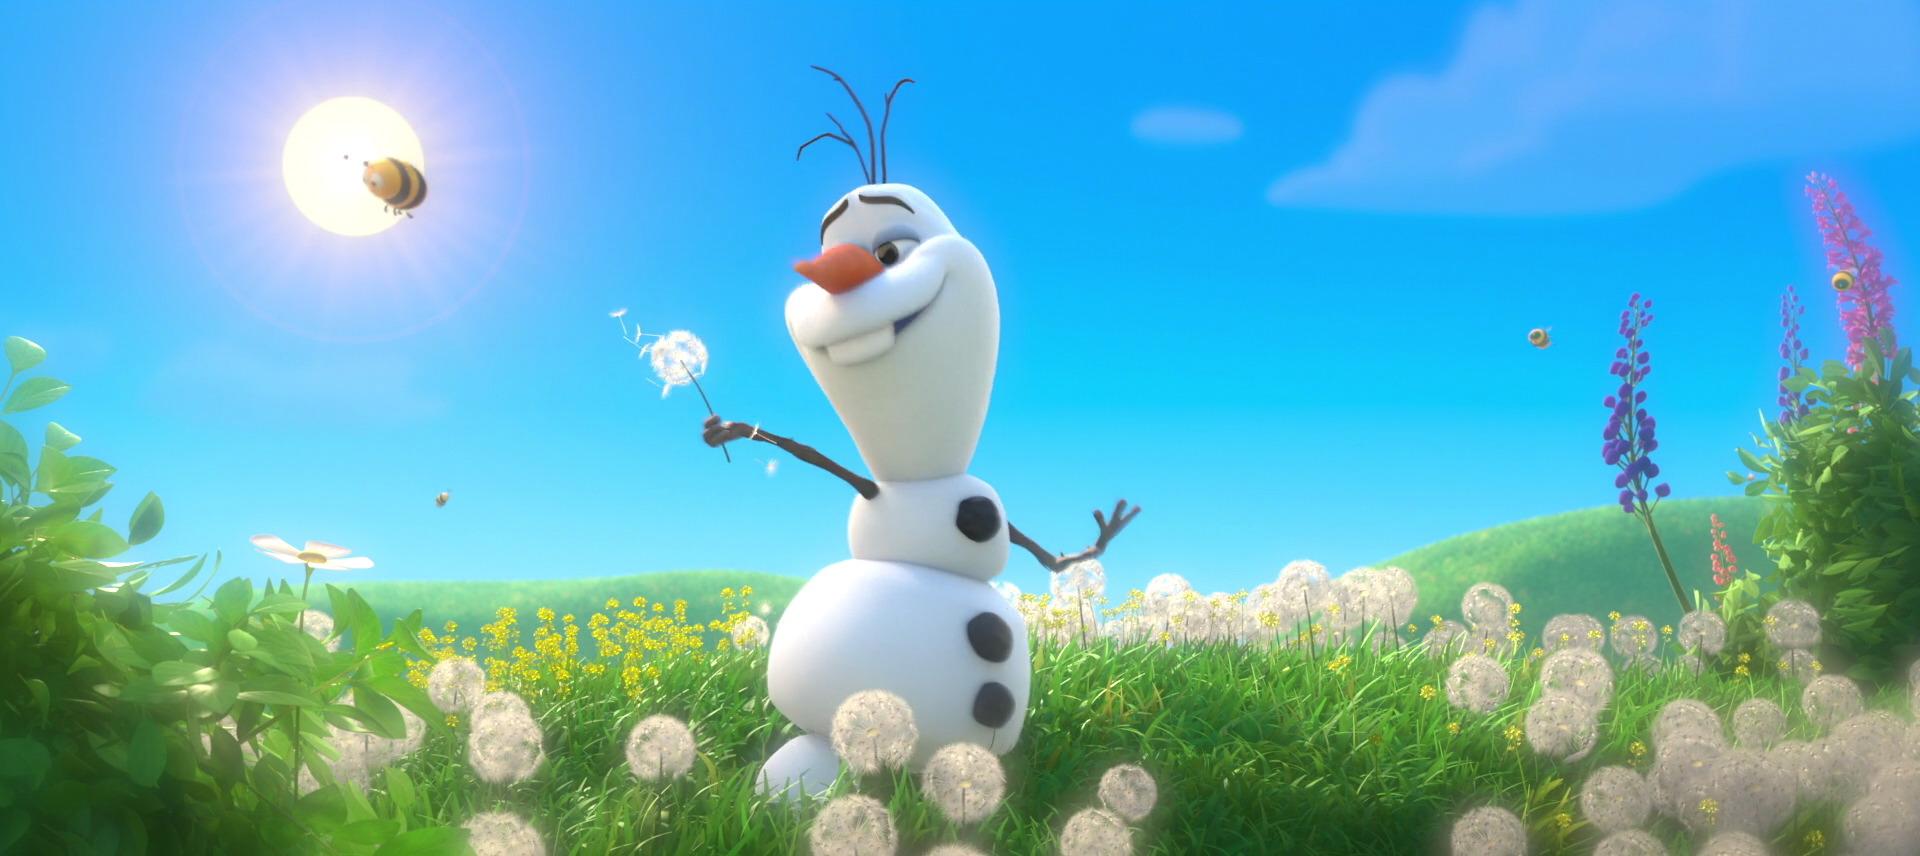 Olaf | Disney Fan Fiction Wiki | FANDOM powered by Wikia